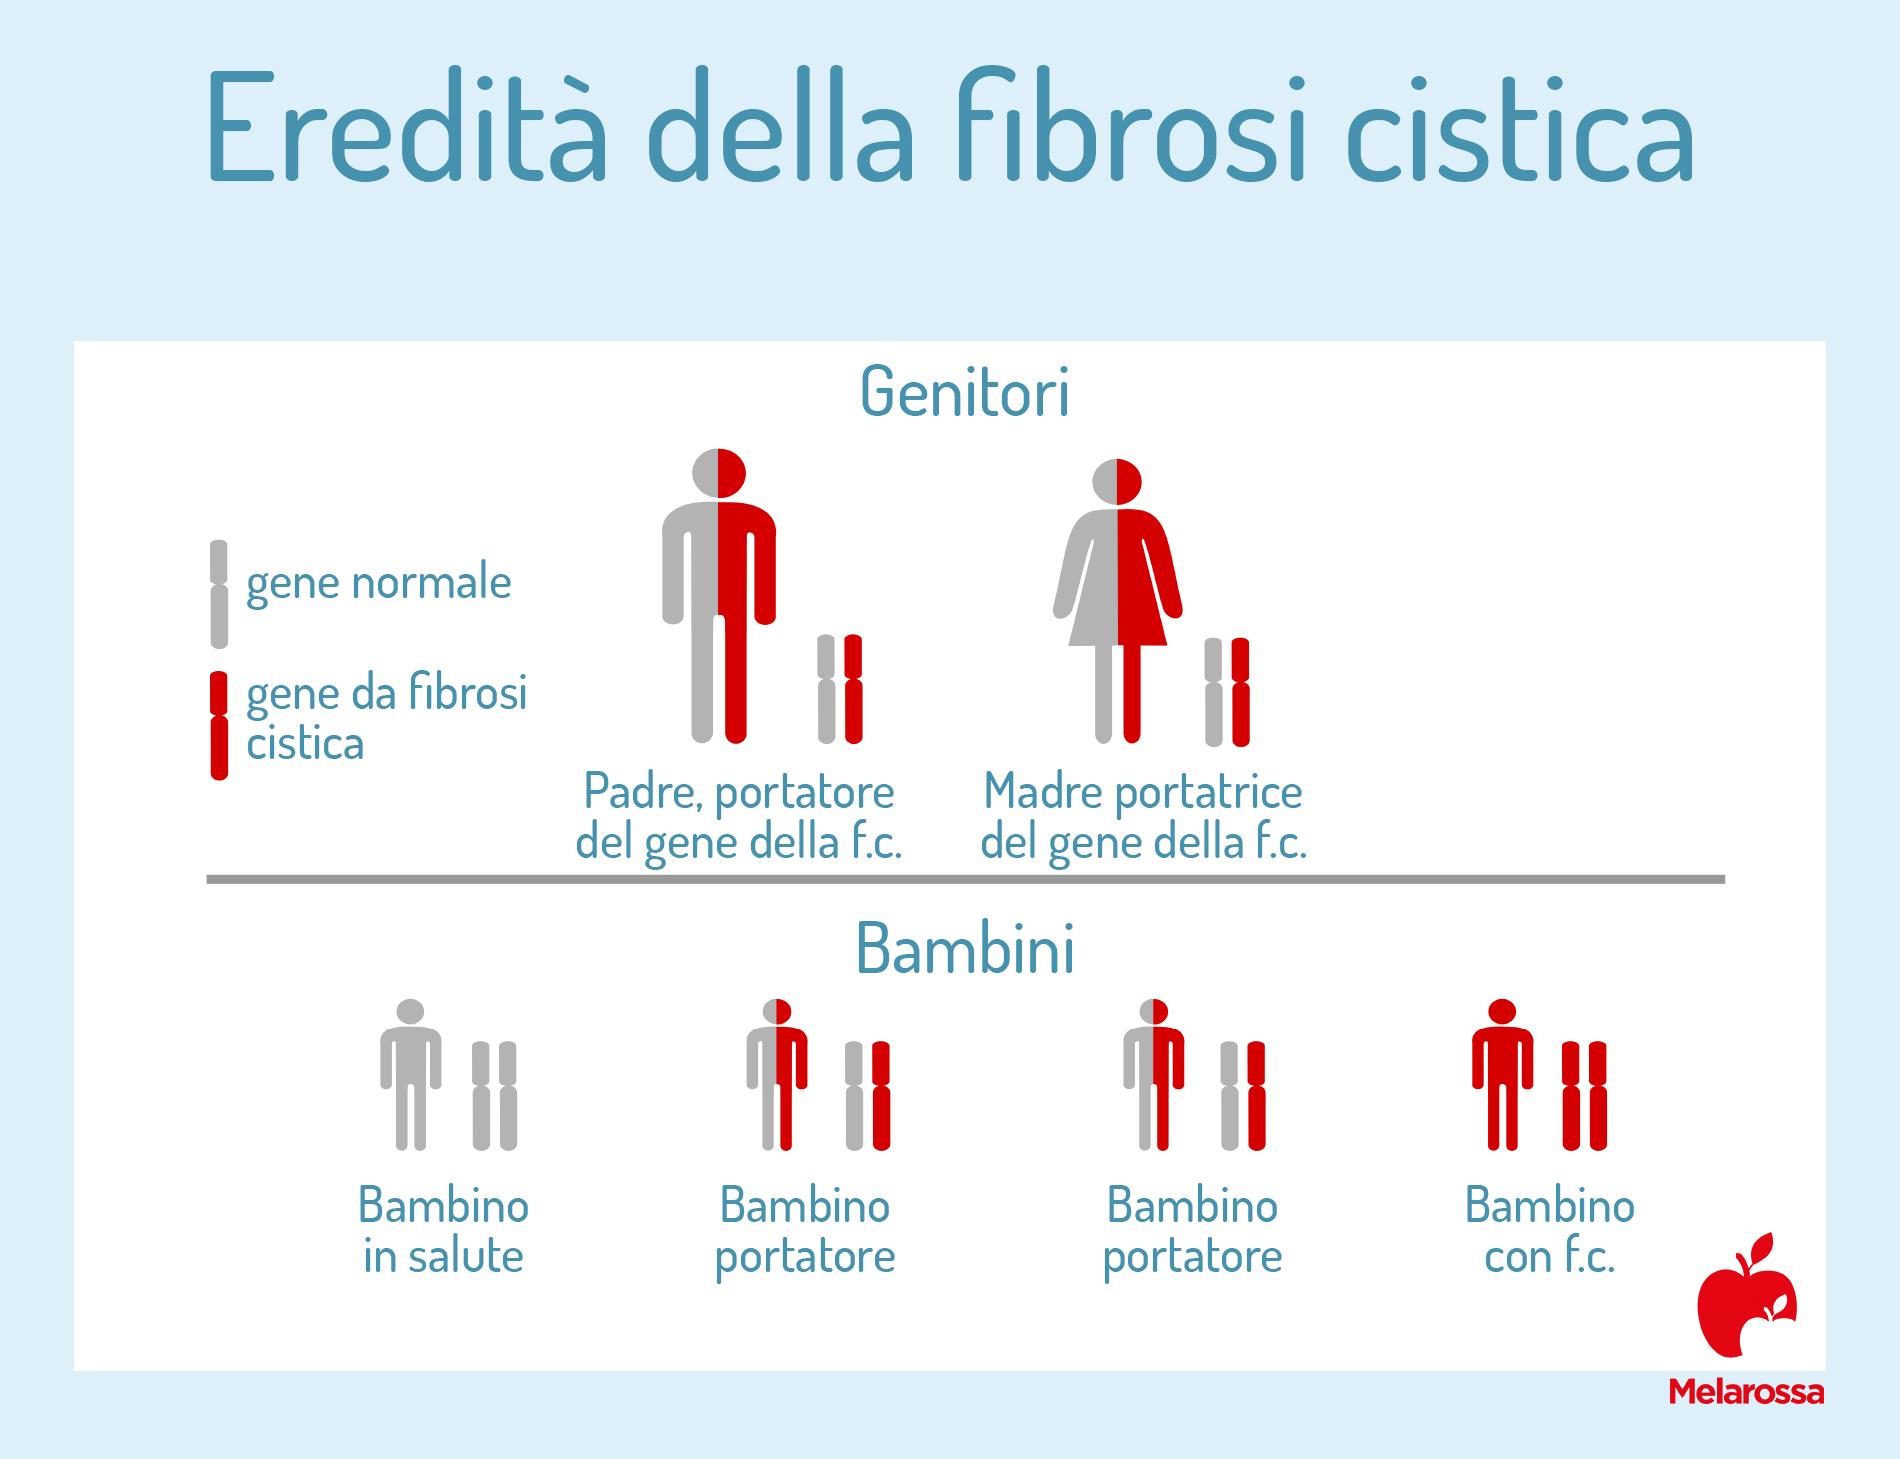 fibrosi cistita: epidemiologia